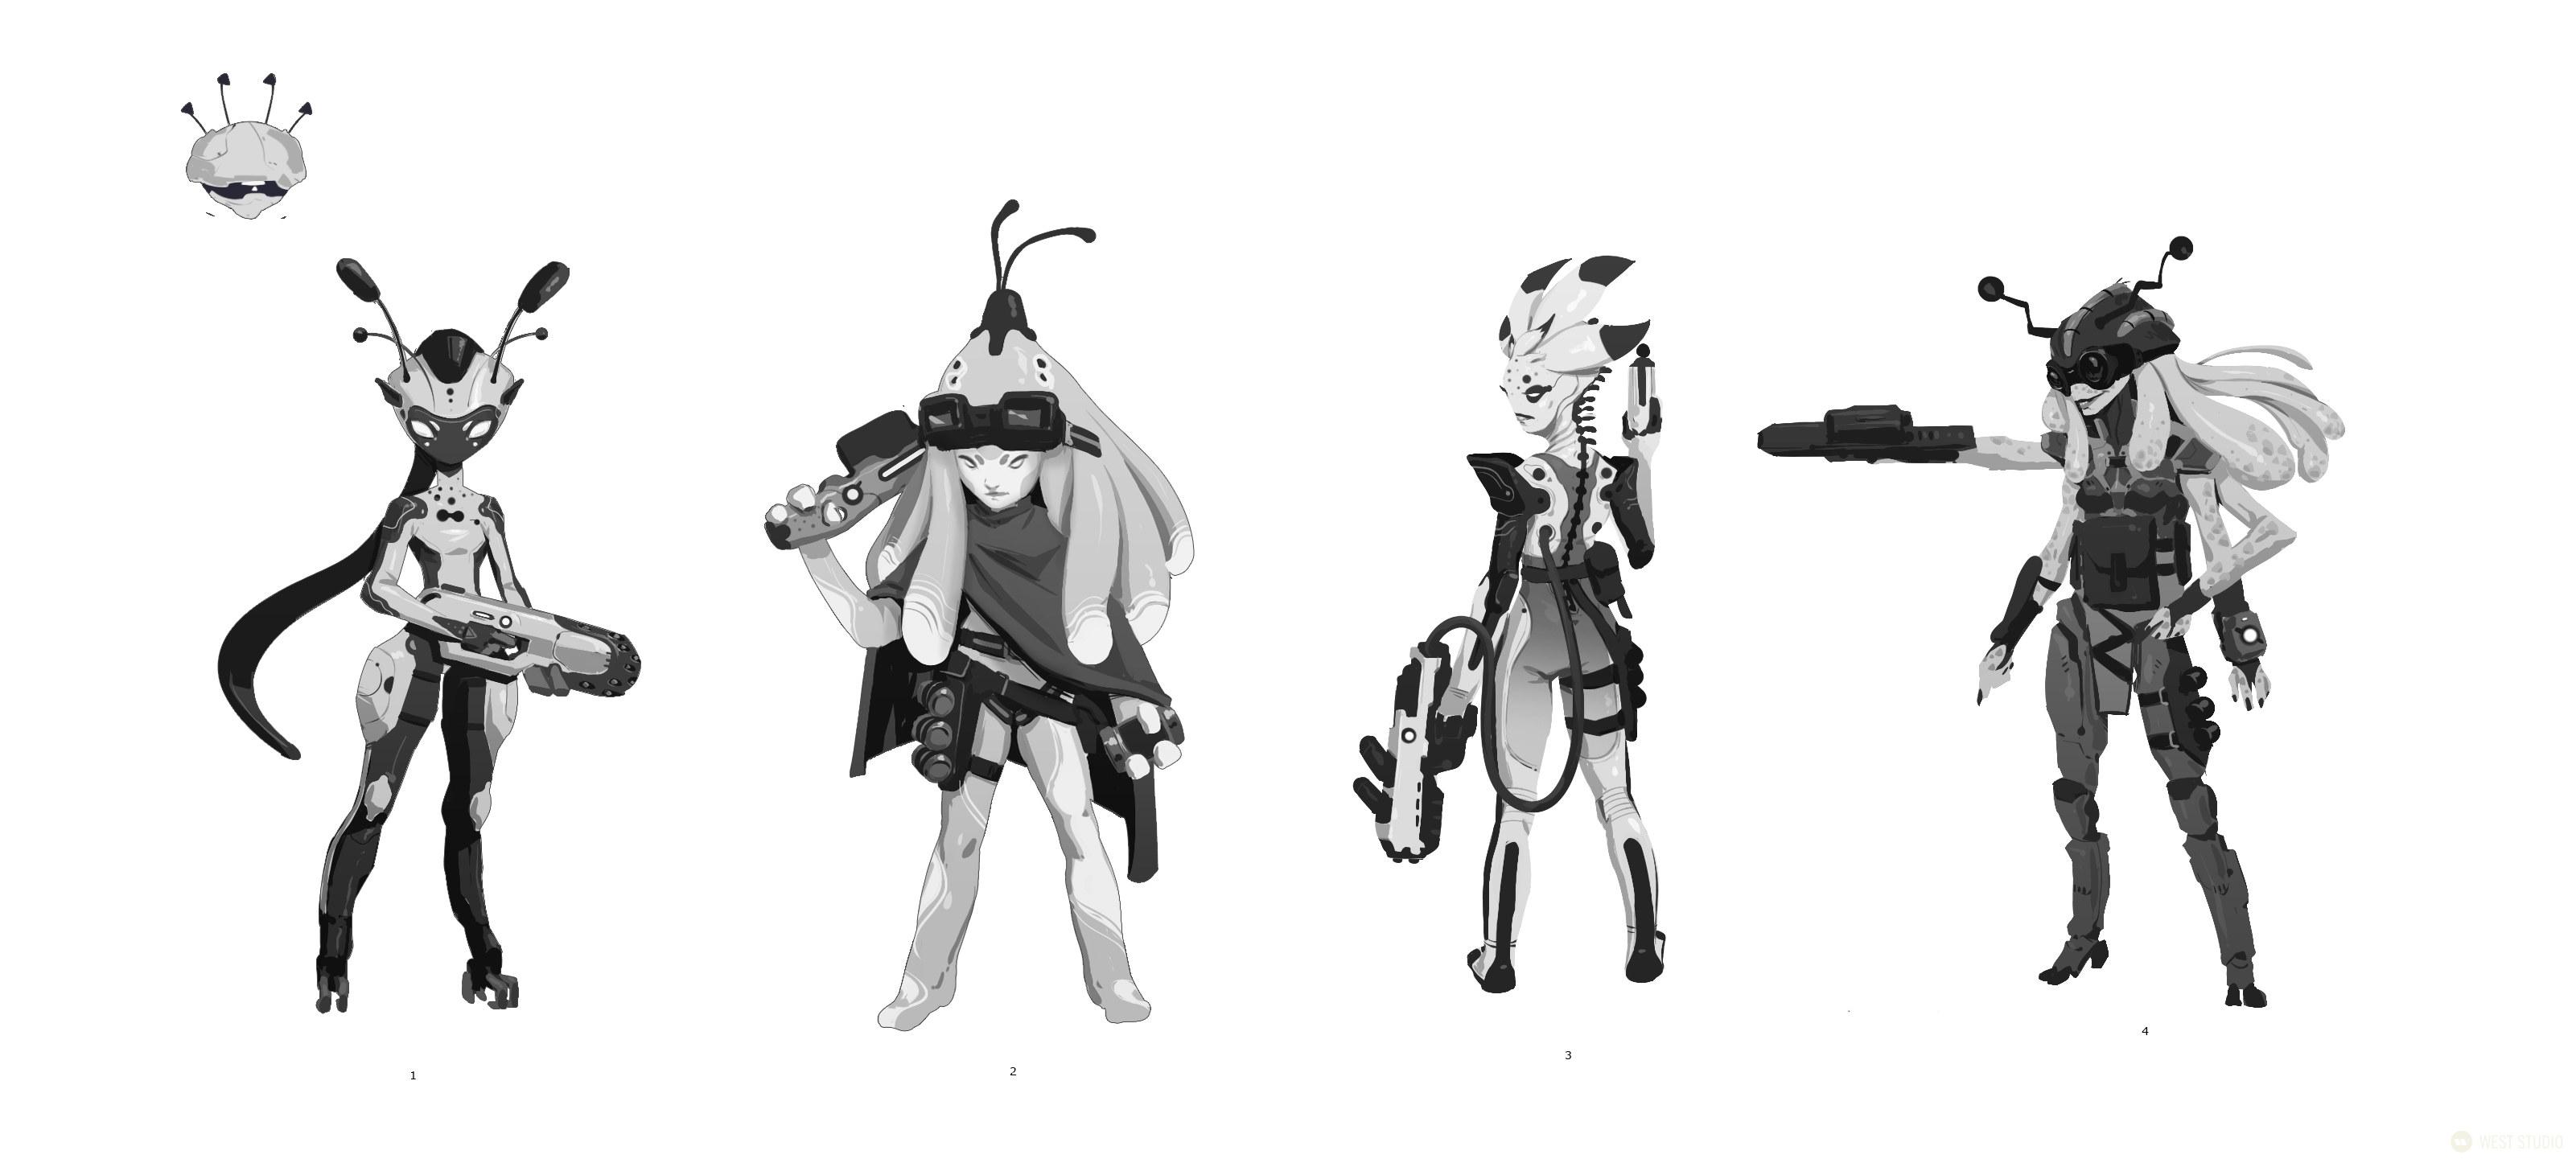 concept art, visual development, character design, creature design, game development, science fiction, sci-fi, key art, stylized